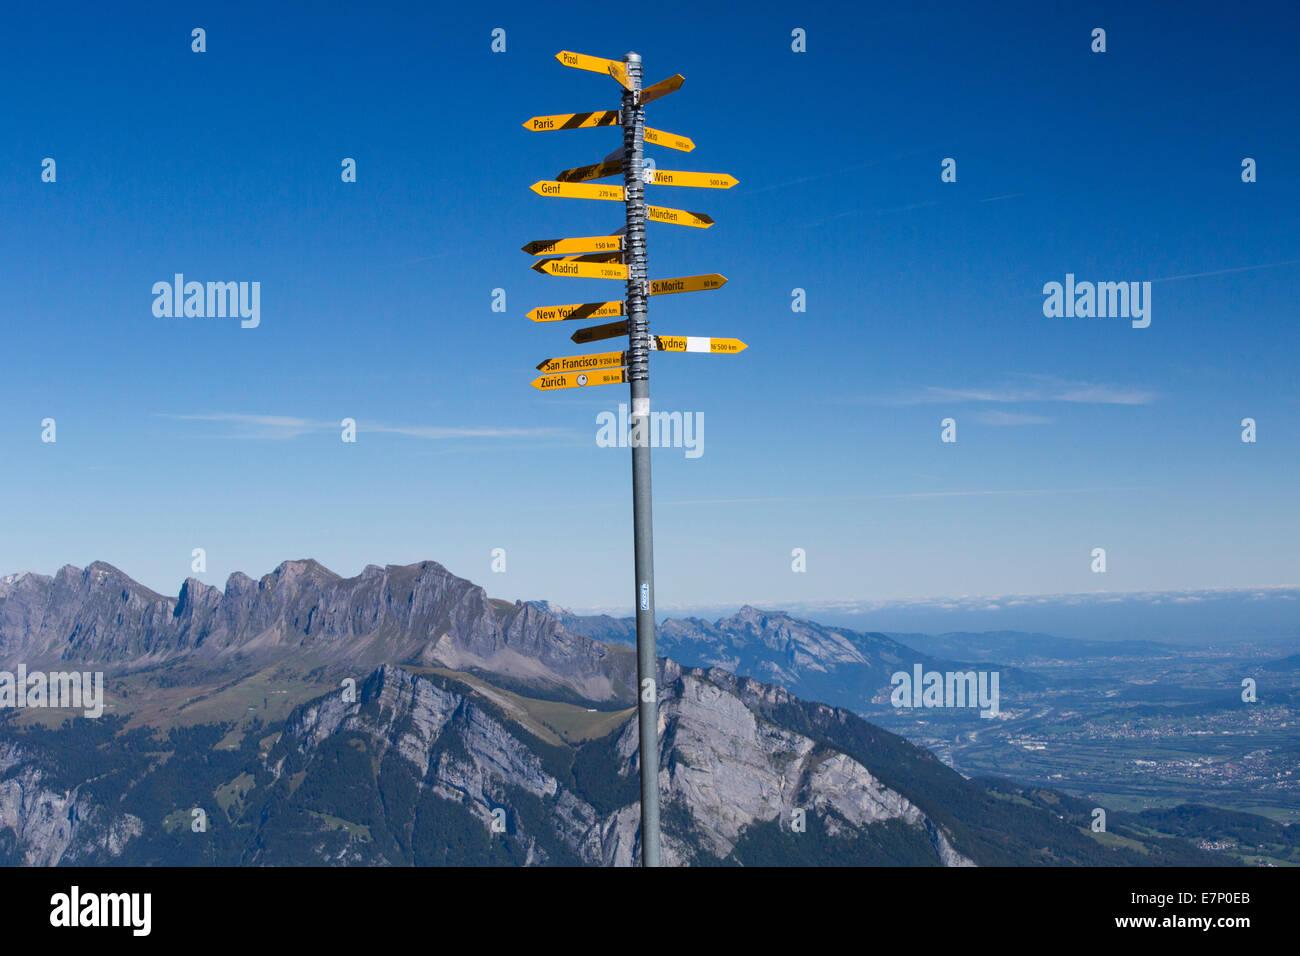 Rhine Valley, signpost, Pizol area, mountain, mountains, SG, canton St. Gallen, footpath, signpost, Switzerland, - Stock Image